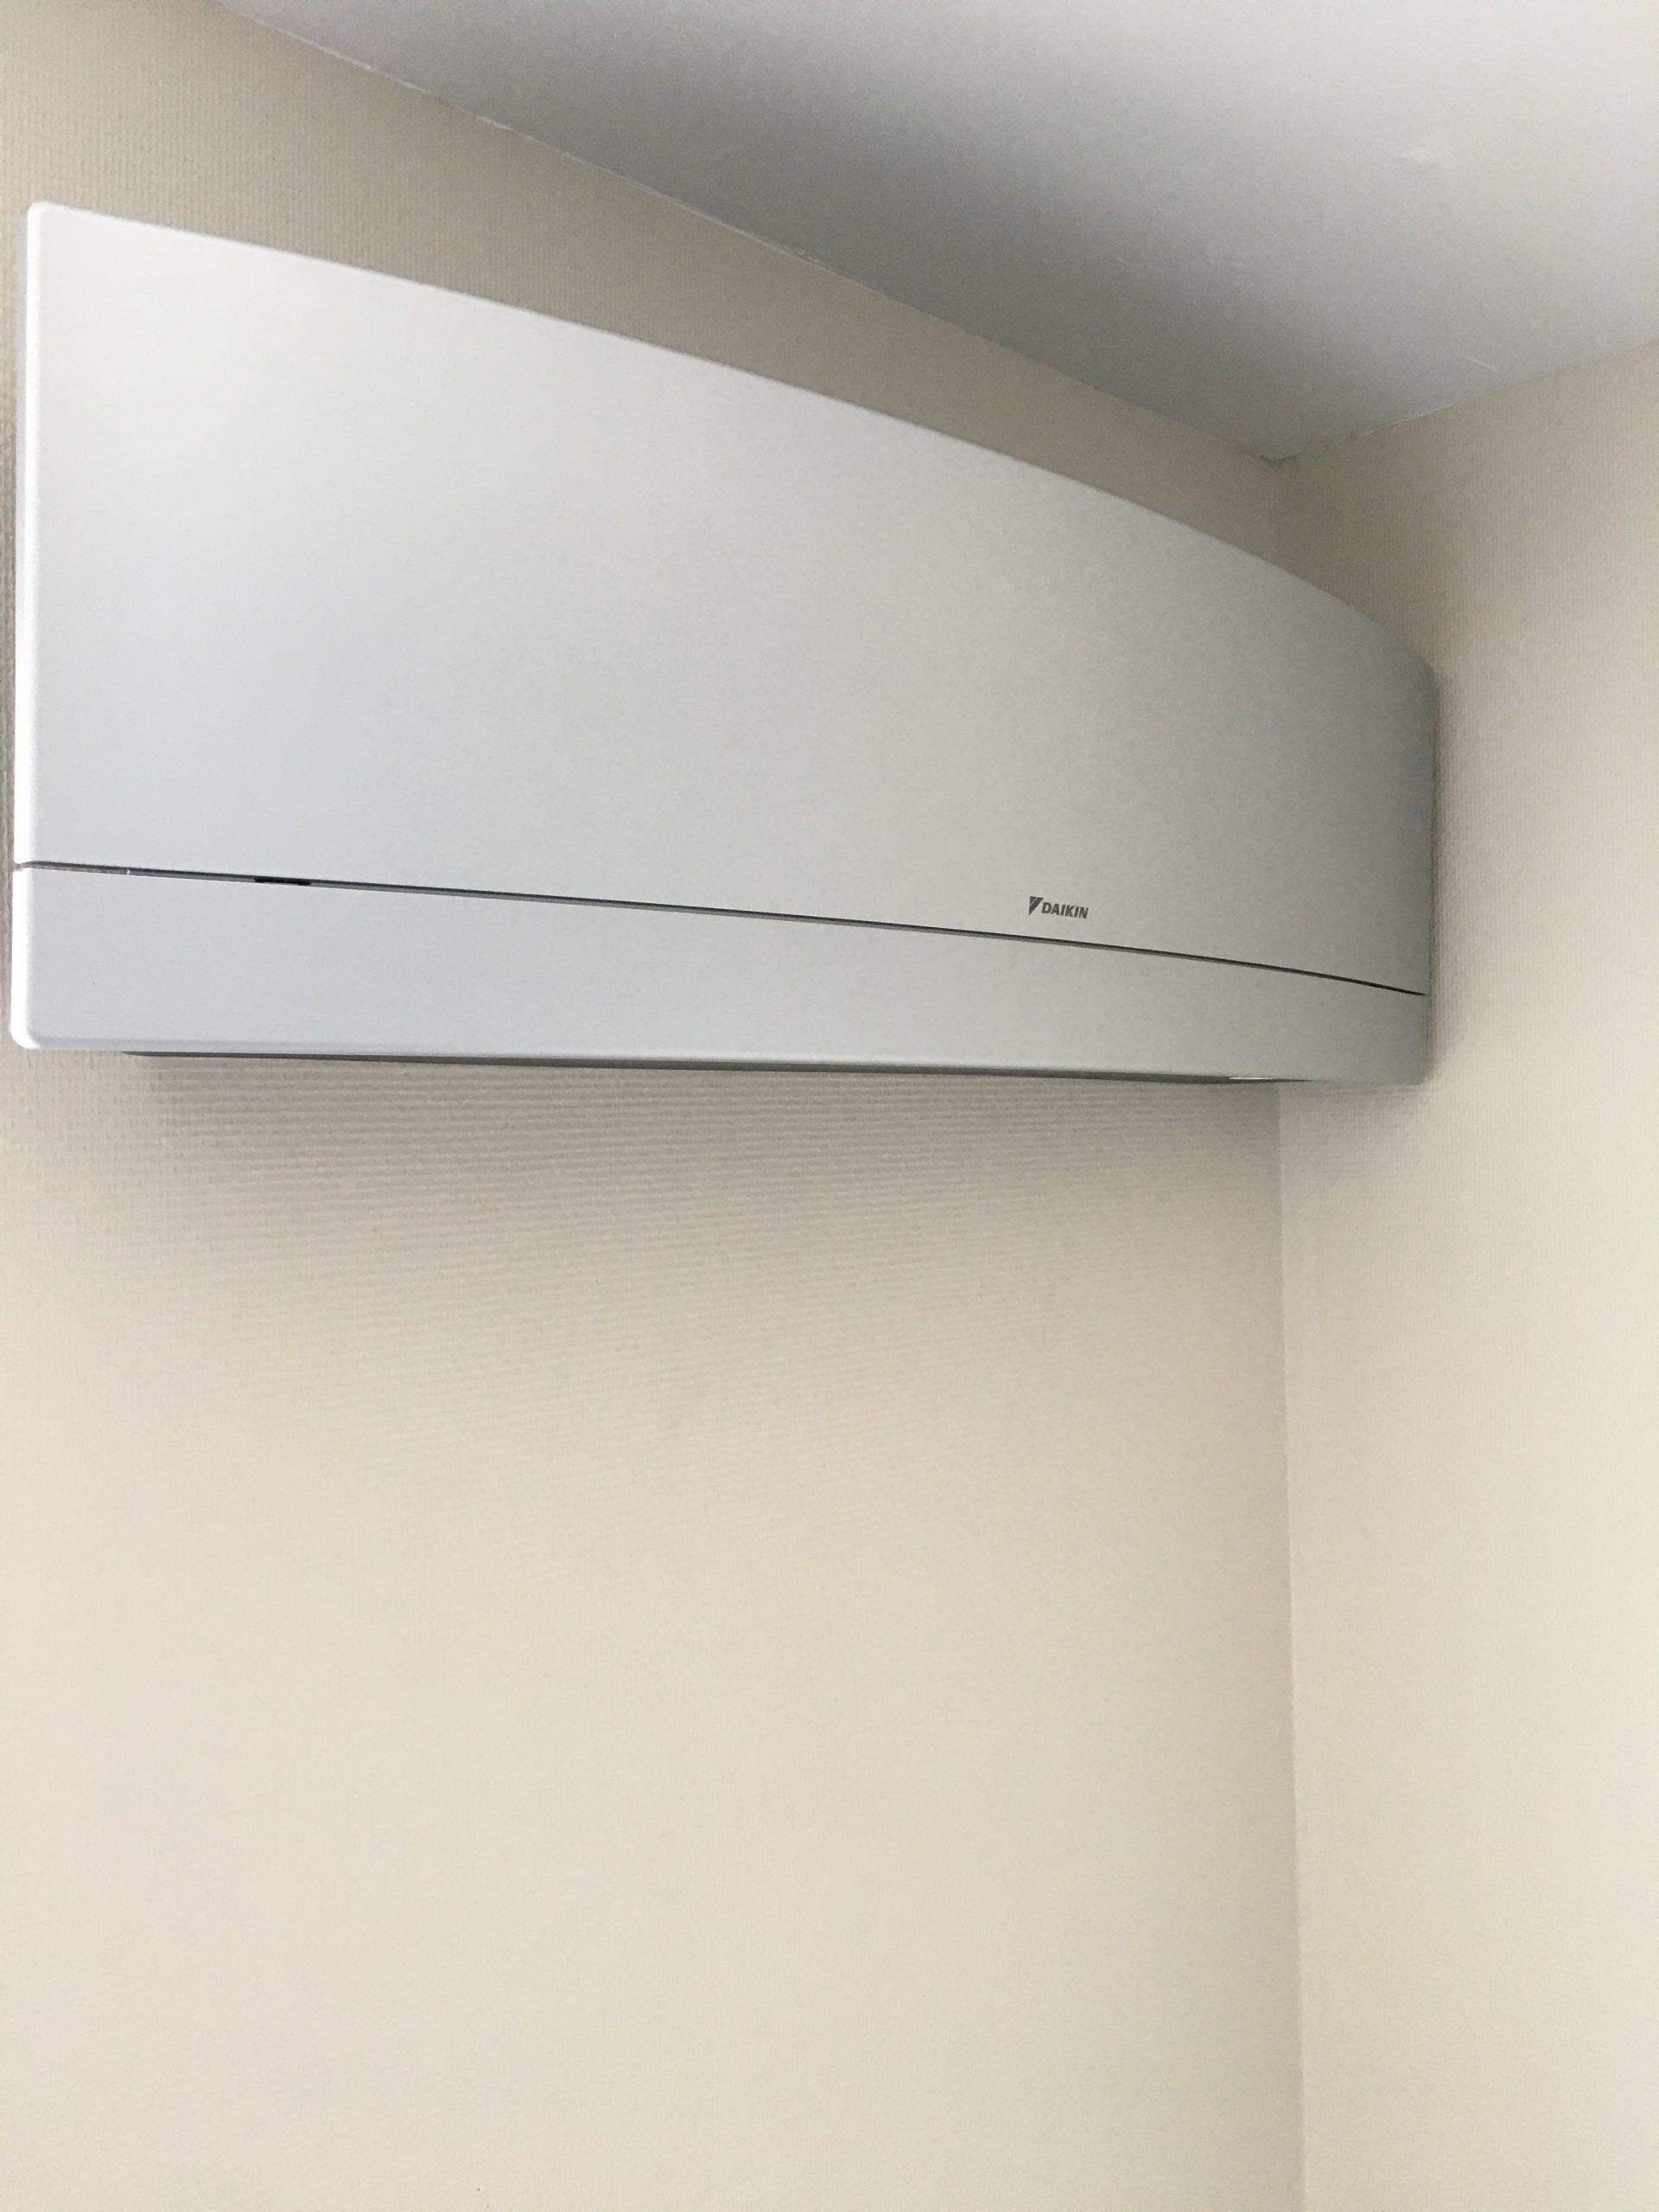 climatisateur monoslipt blanc